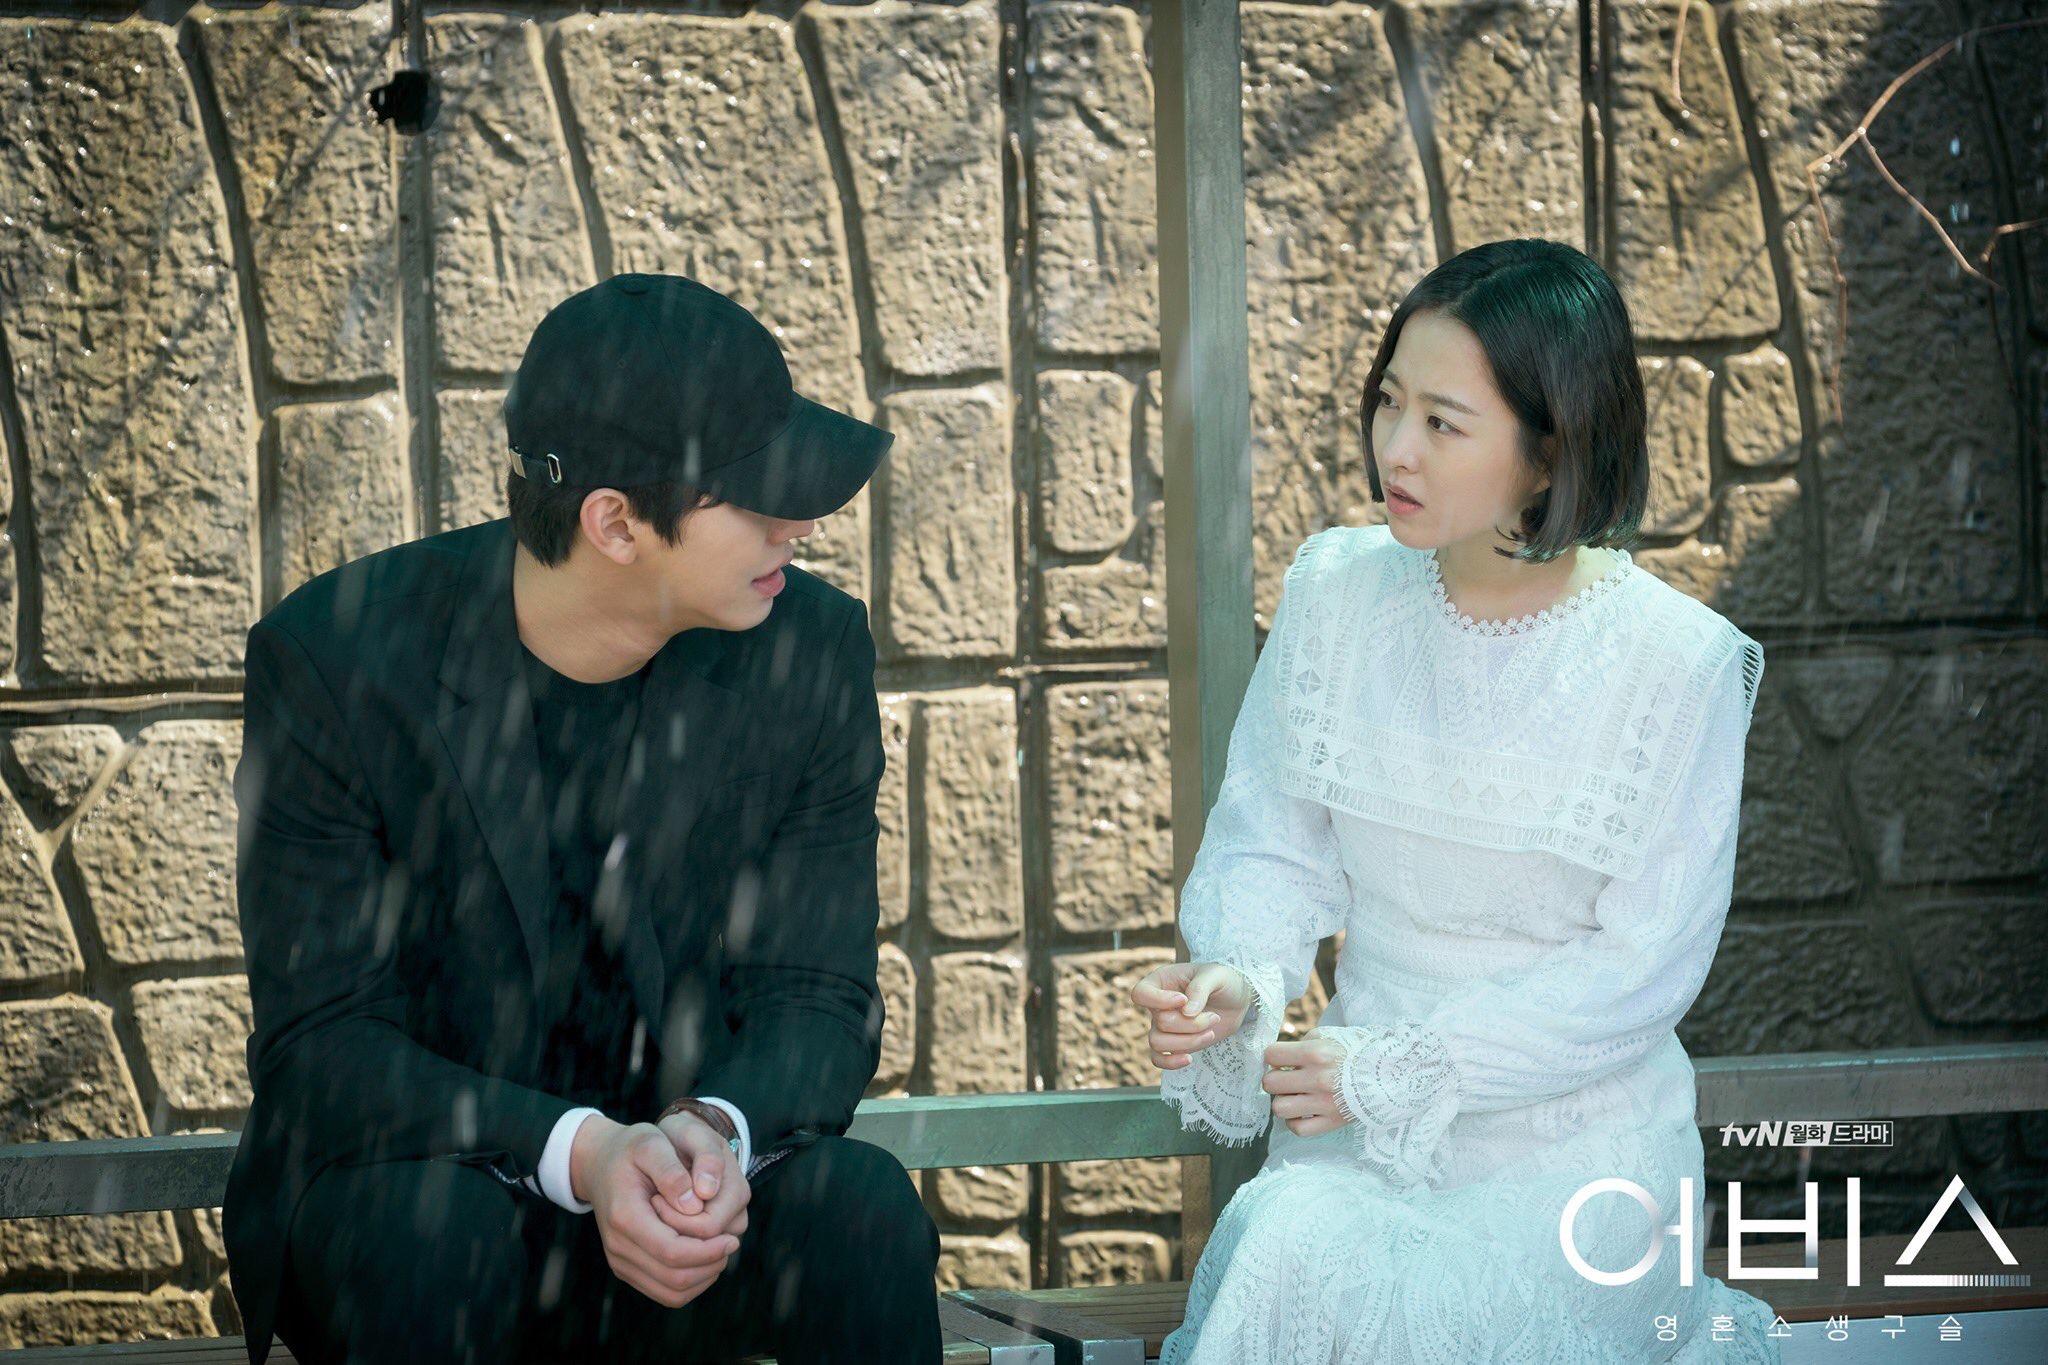 tvN新月火剧《Abyss:灵魂复活珠》召开首播发表会 主演纷纷到场